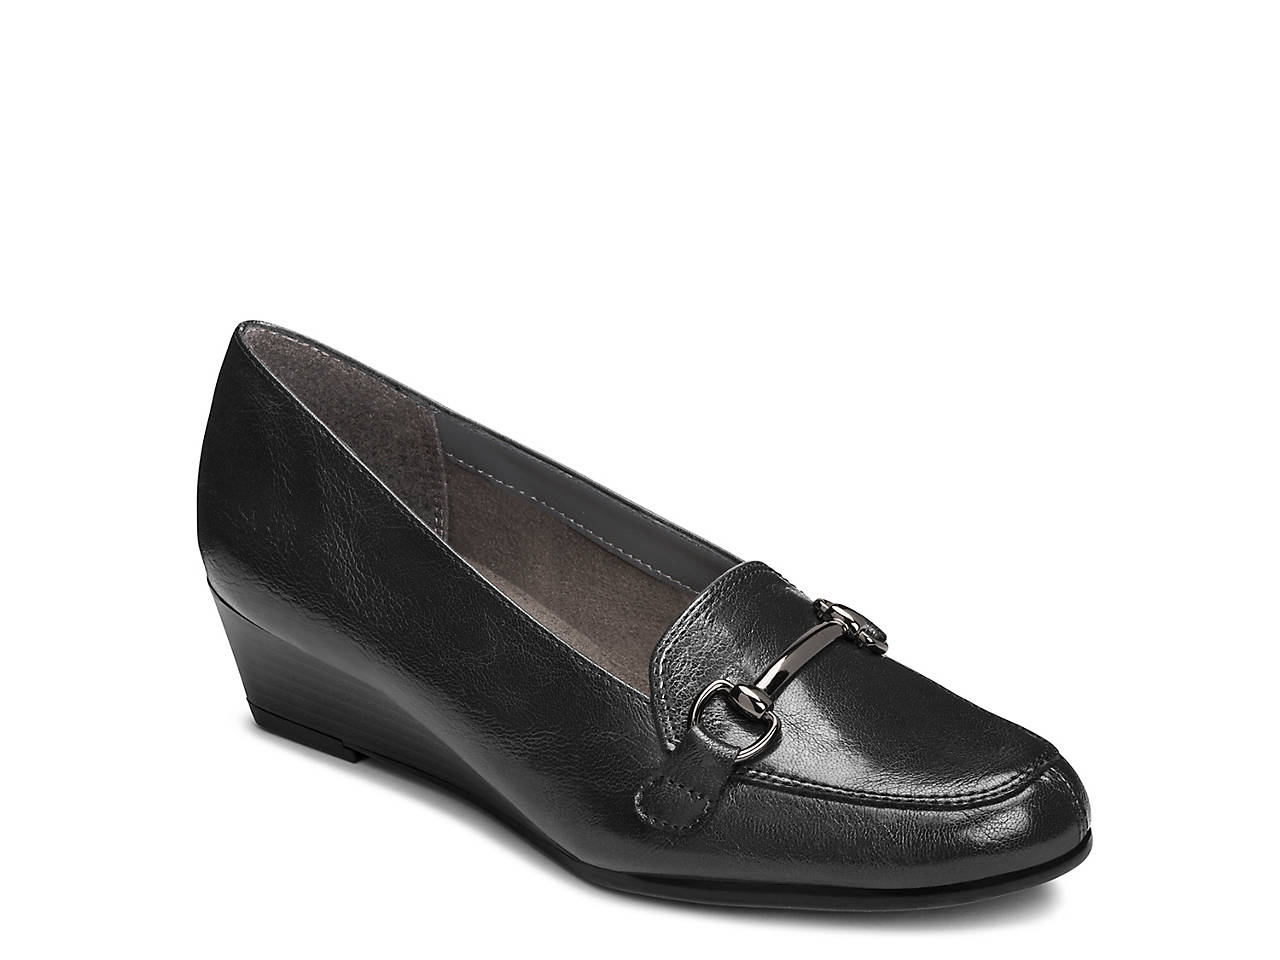 A2 by Aerosoles Love Spell ... Women's Wedge Loafers new styles for sale VWKO5EELz